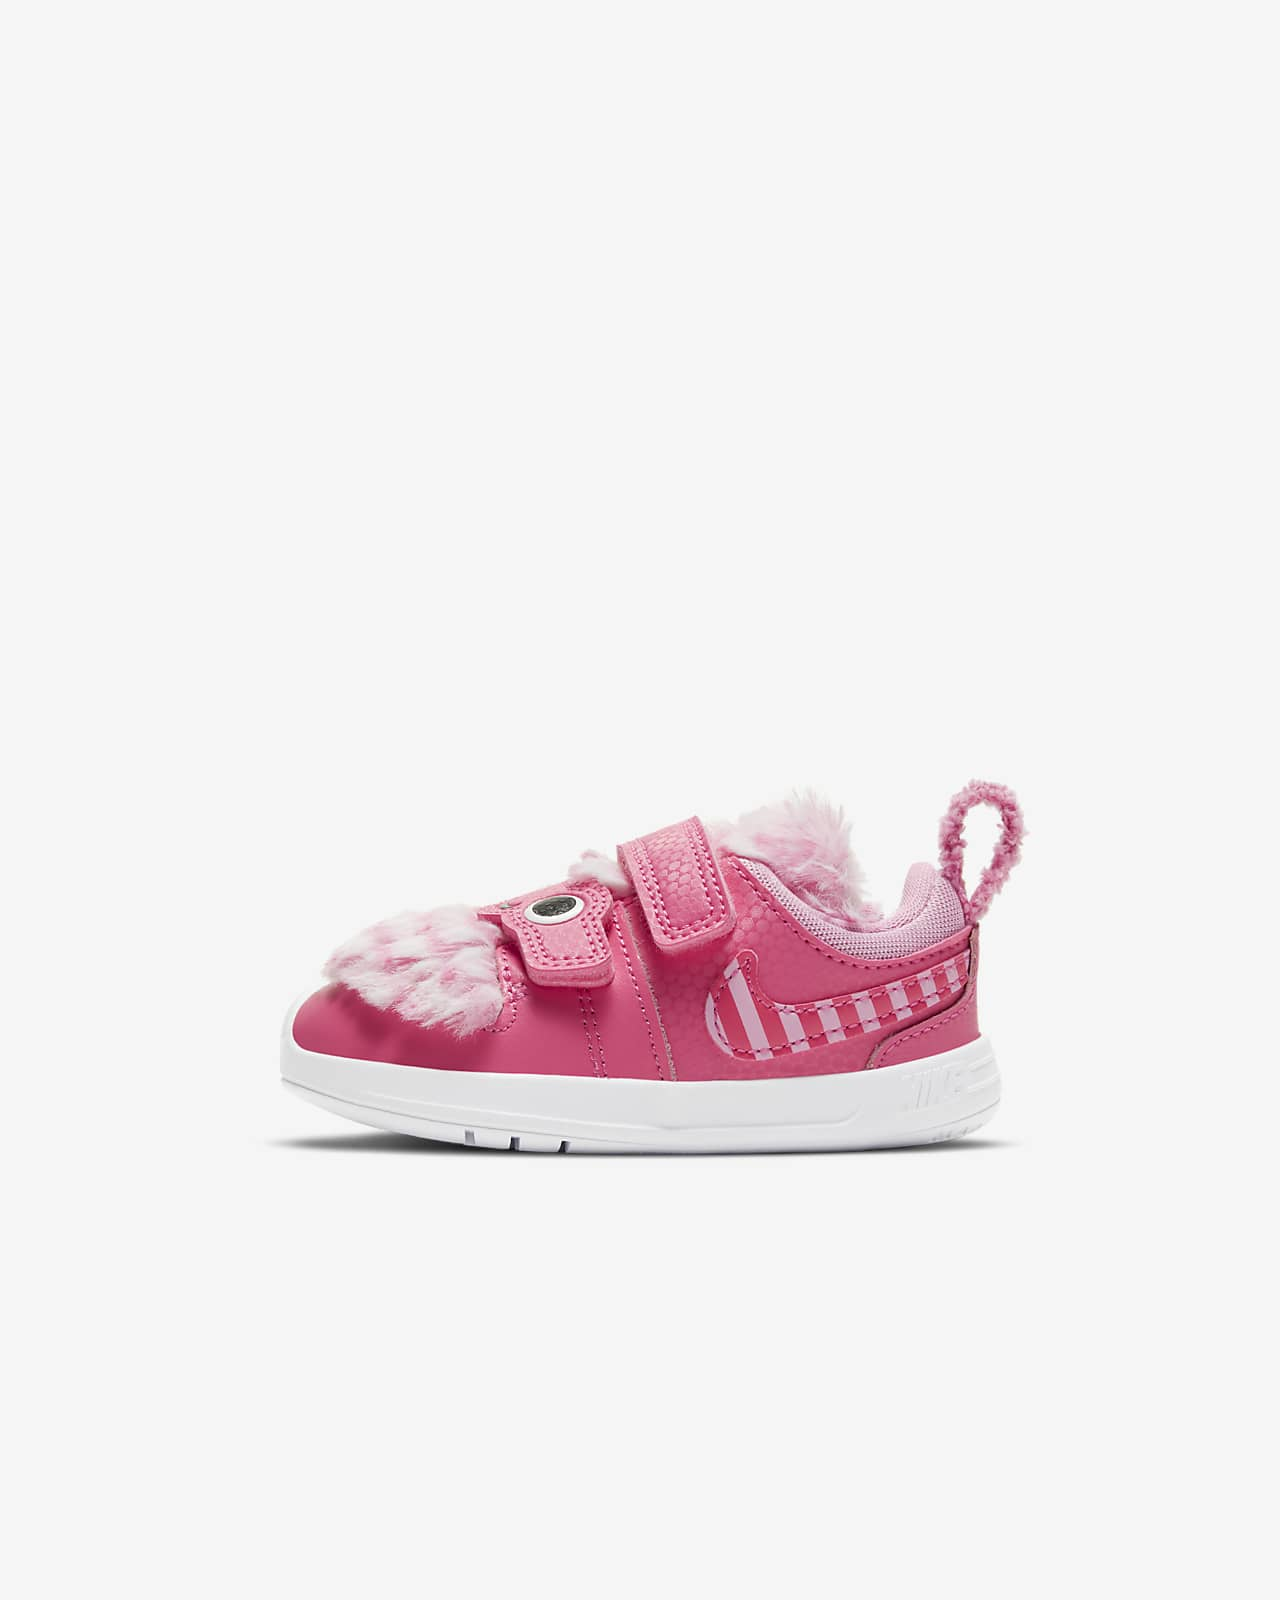 Nike Pico 5 Fast n Furry Baby & Toddler Shoe